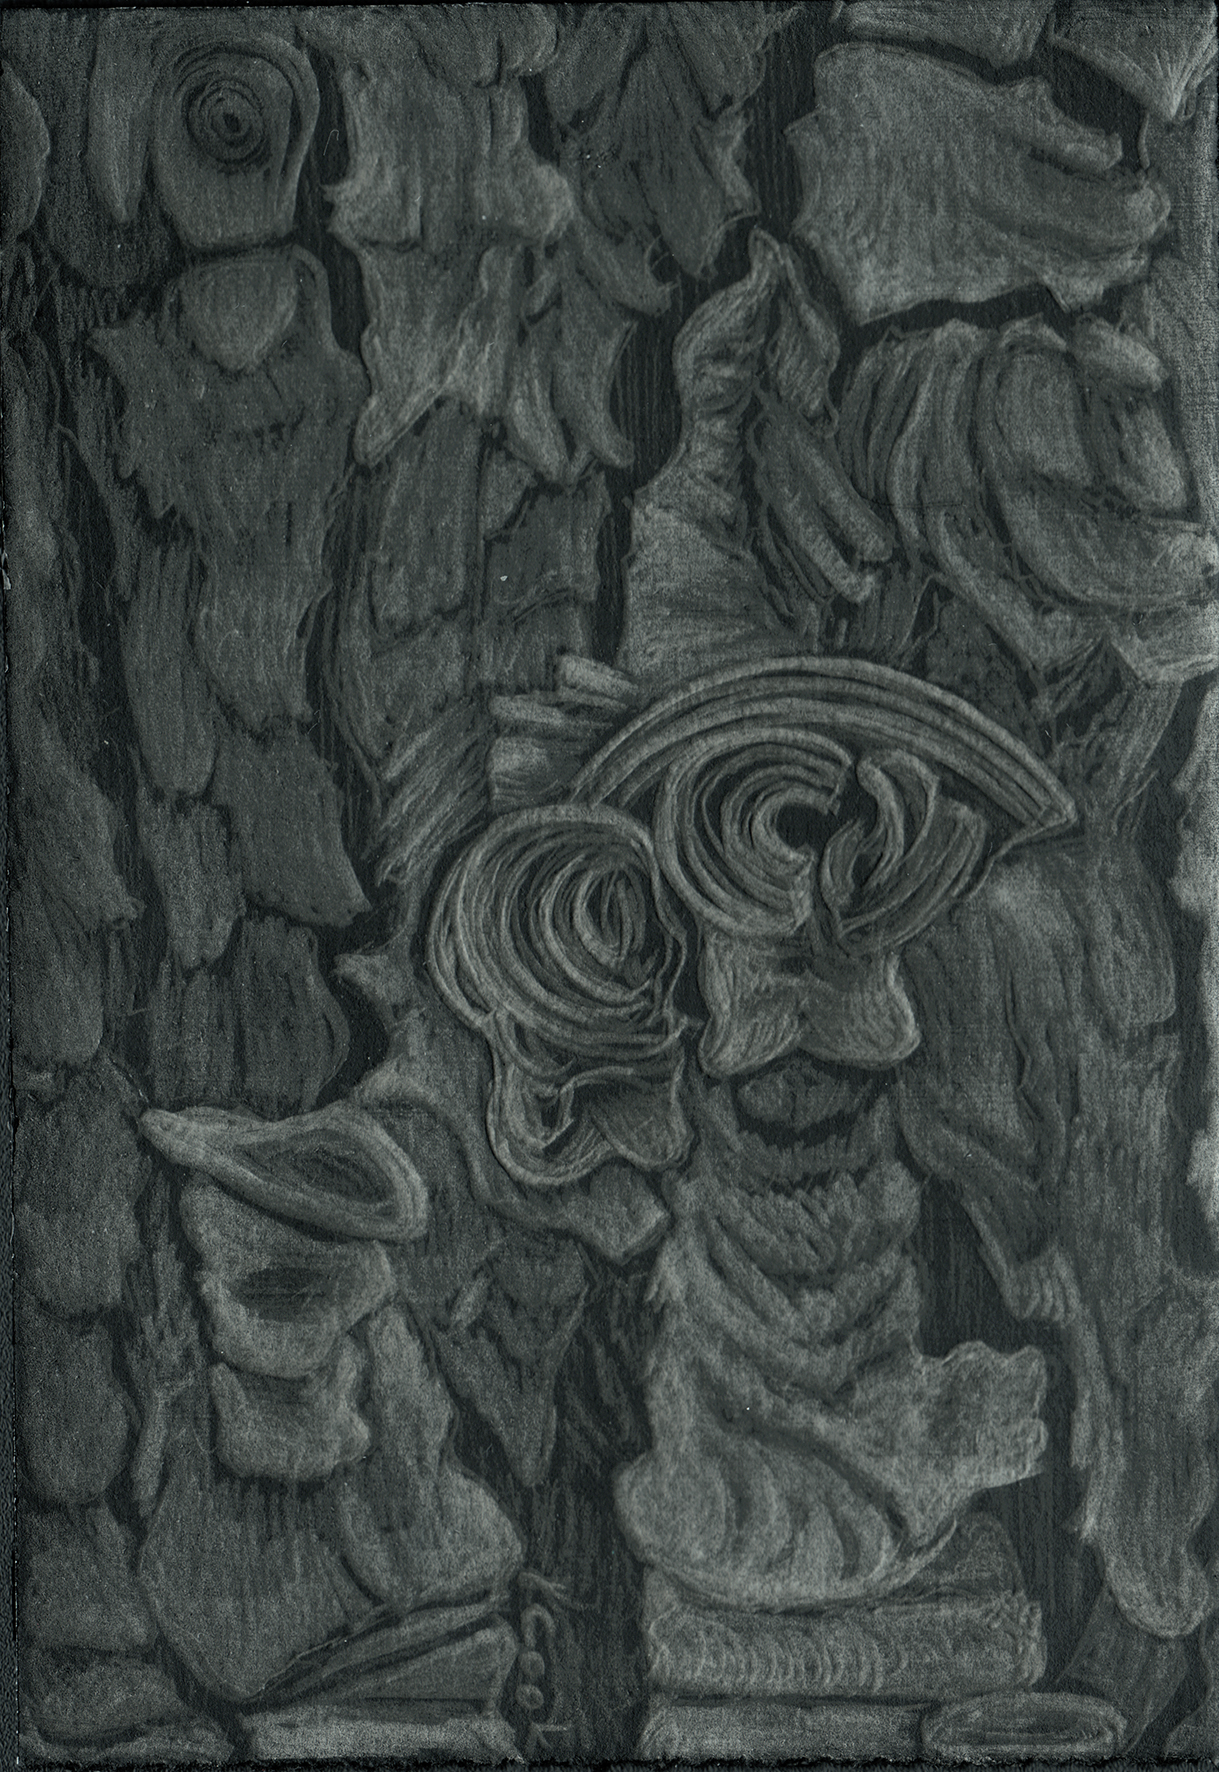 Apoyos IV - Pine tree bark - silverpoint. Jeannine Cook artist